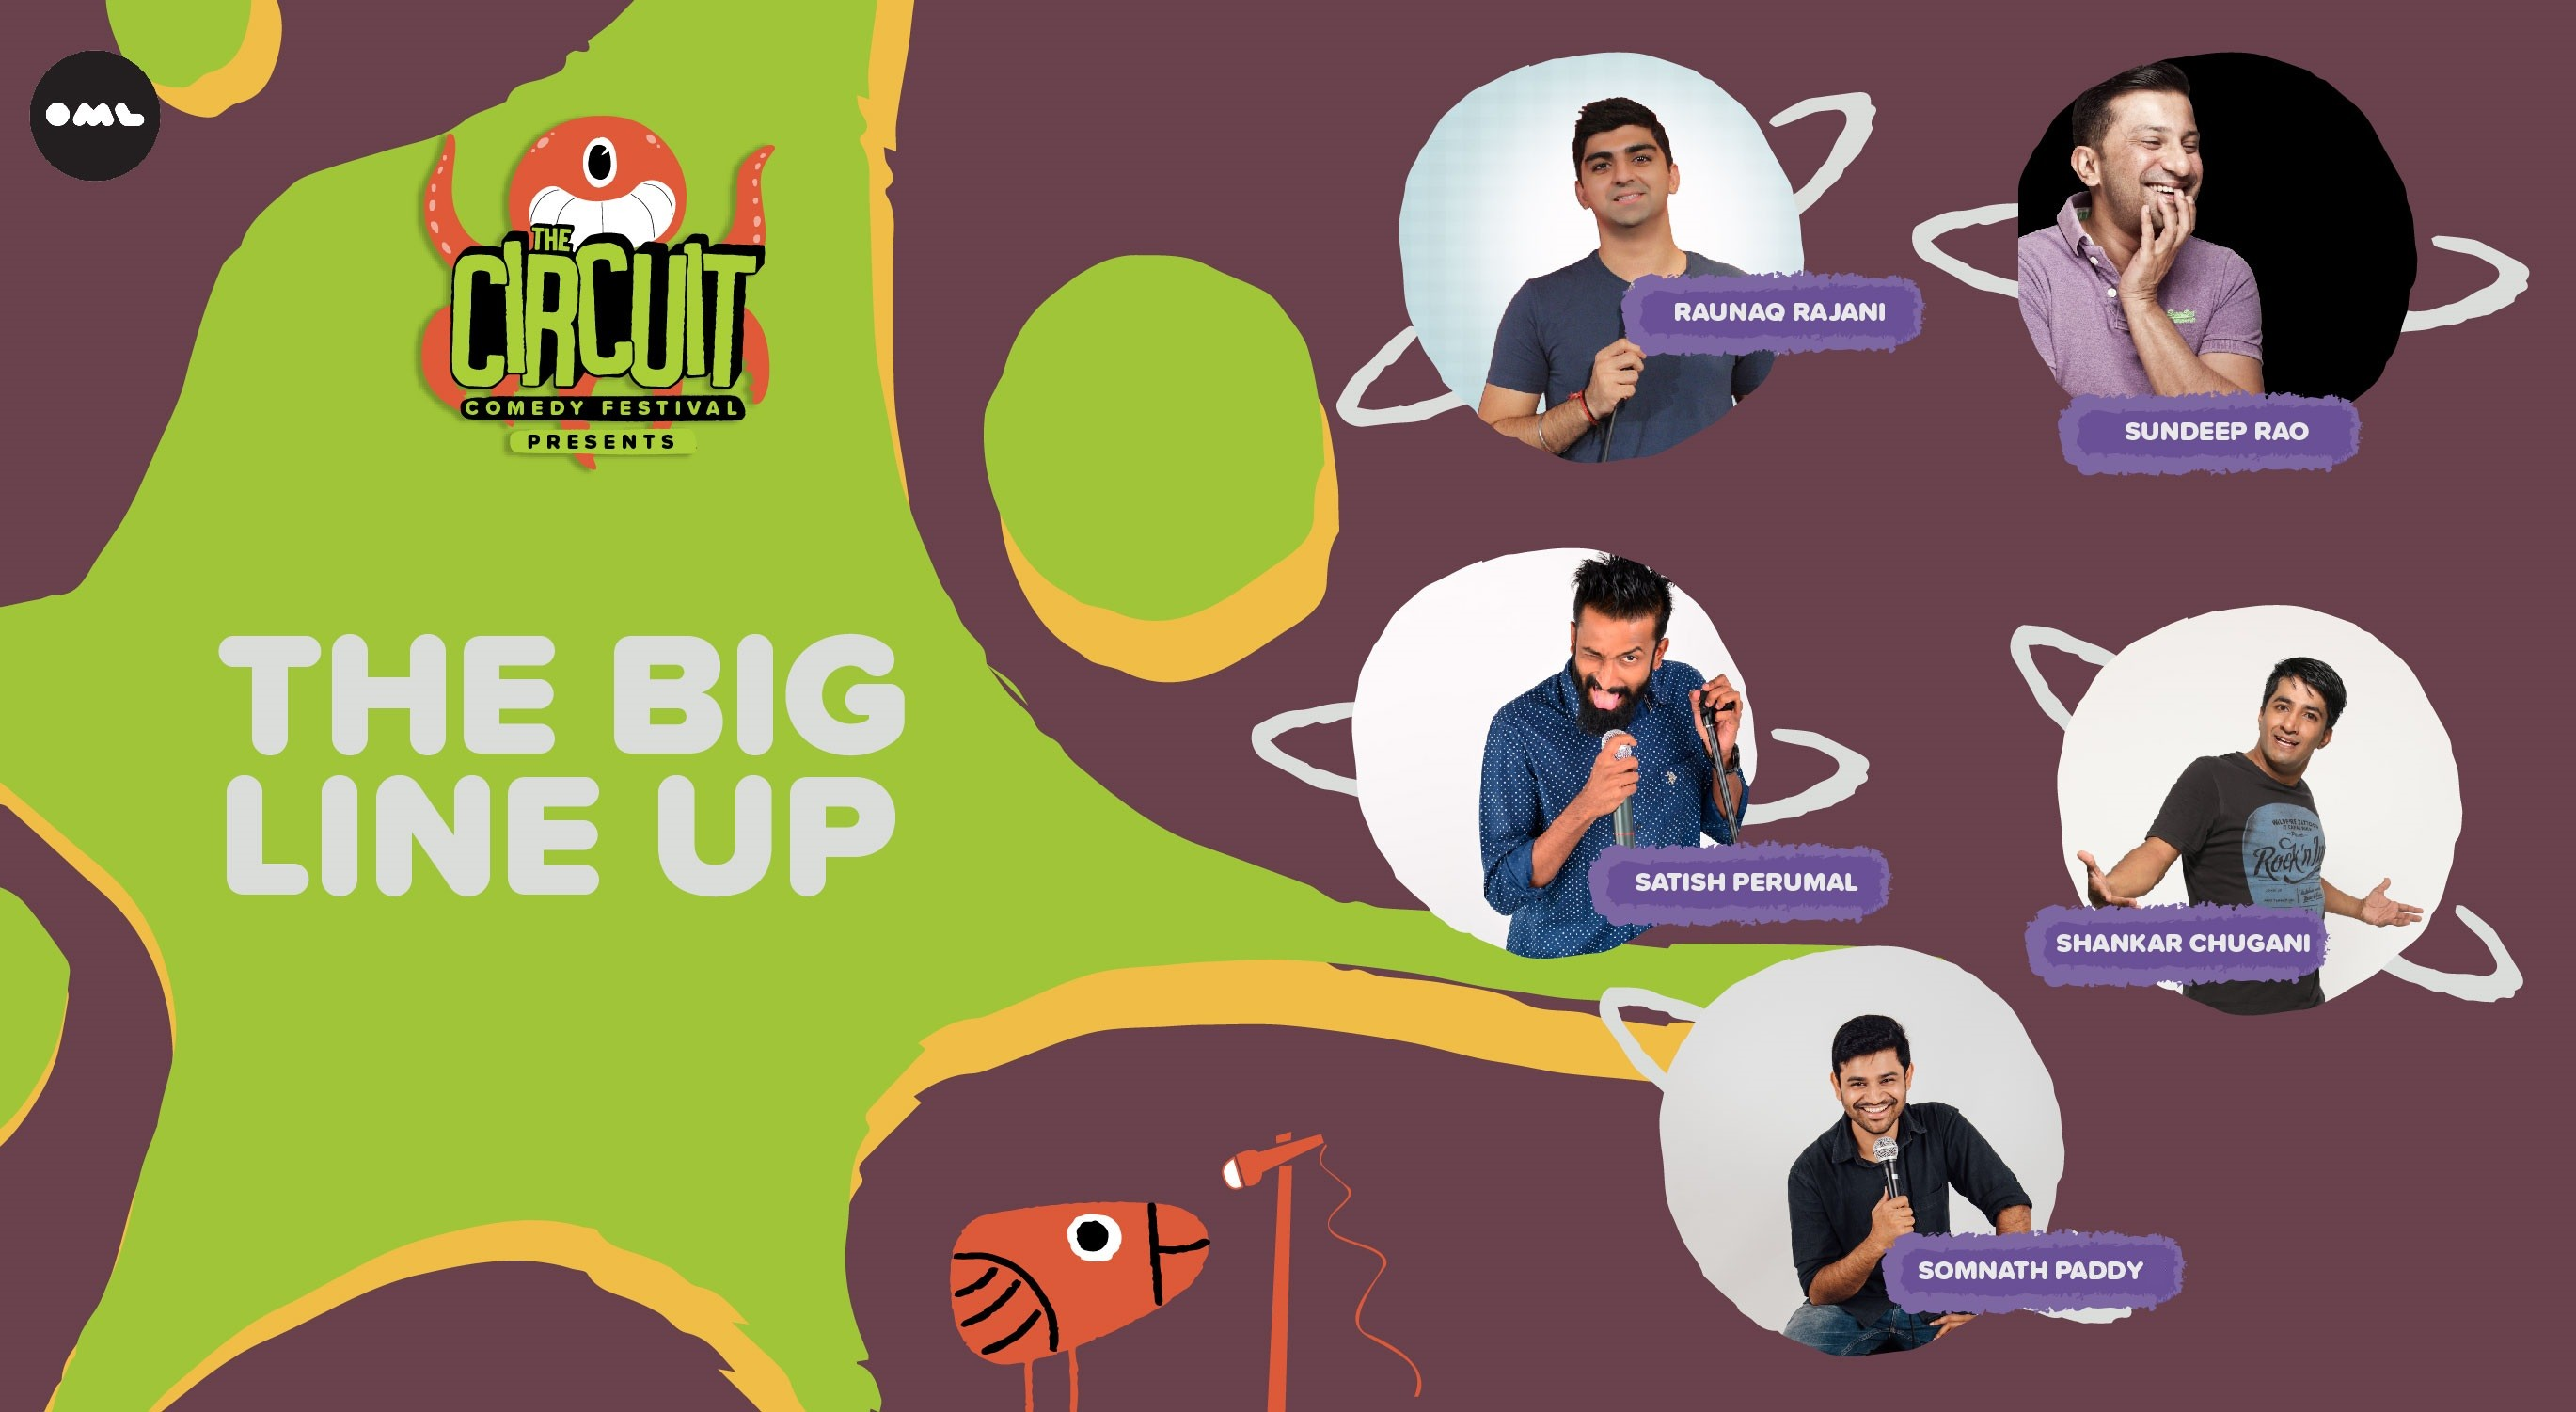 The Big Line-up | The Circuit Comedy Festival, Bengaluru